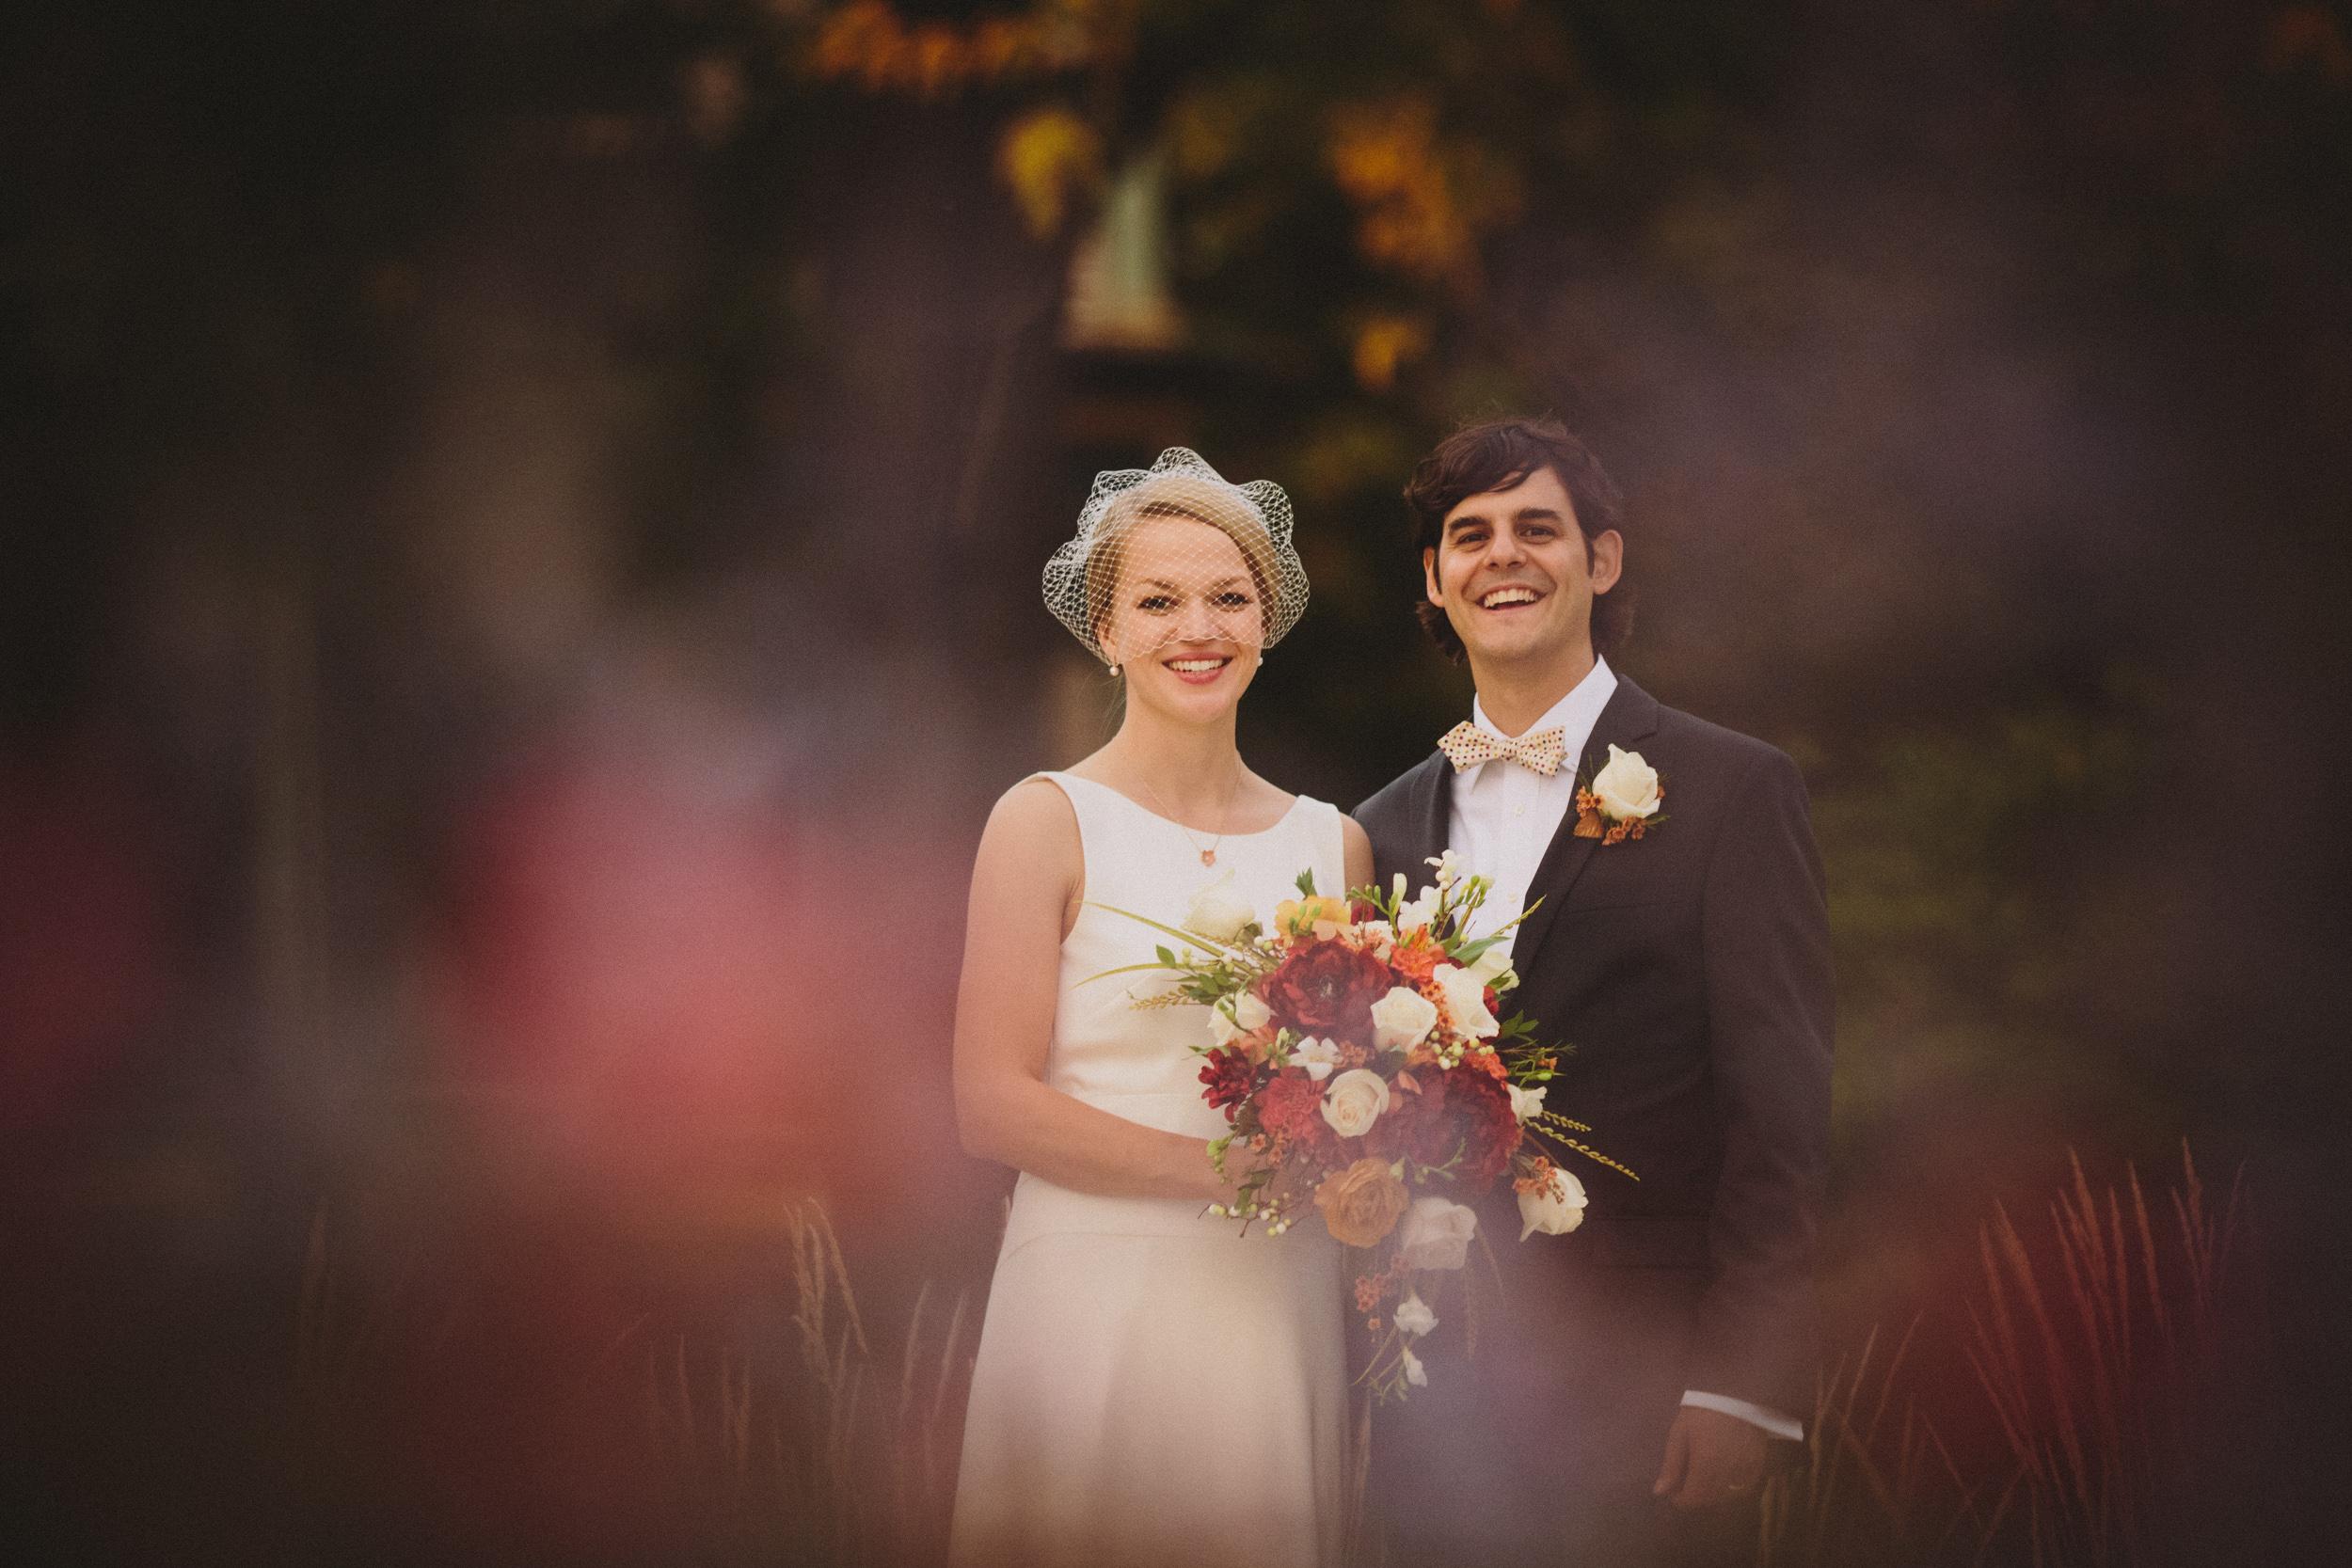 10-05-2013 maggie & adam wedding photography by brian milo-148.jpg